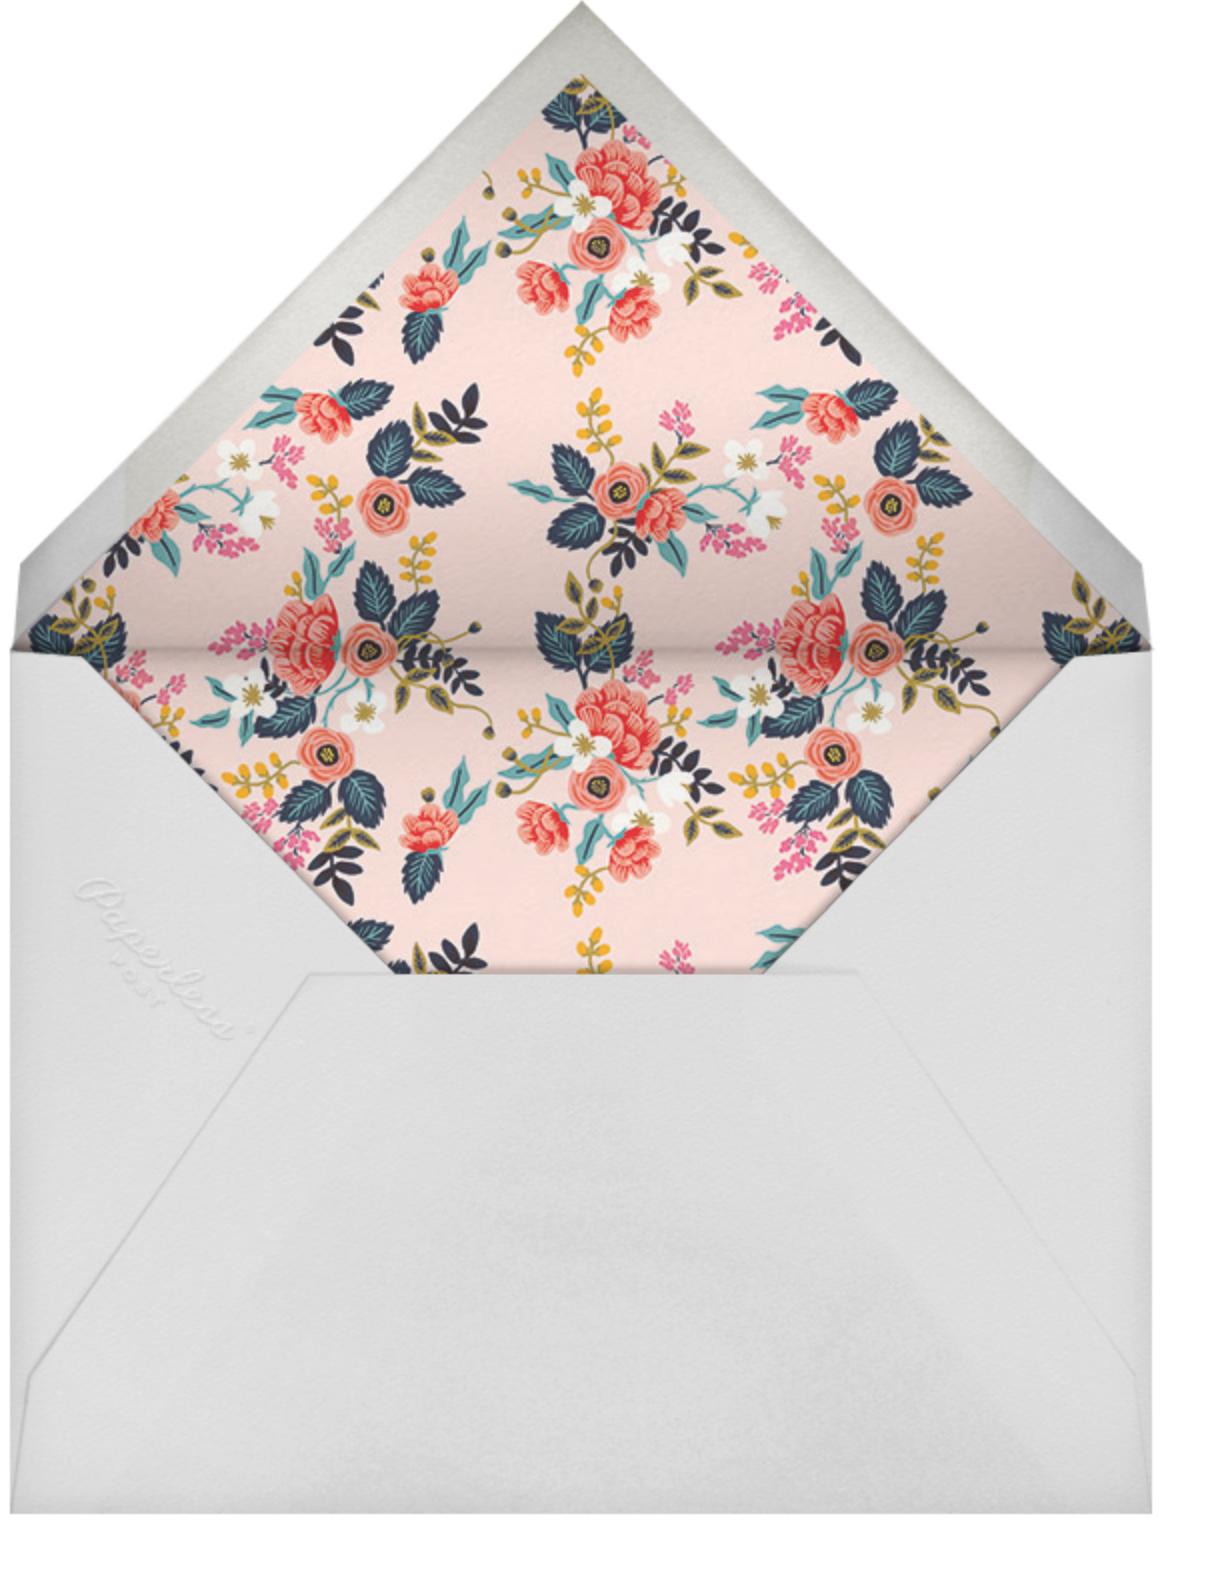 Birch Monarch (Frame) - Black - Rifle Paper Co. - Milestone  - envelope back